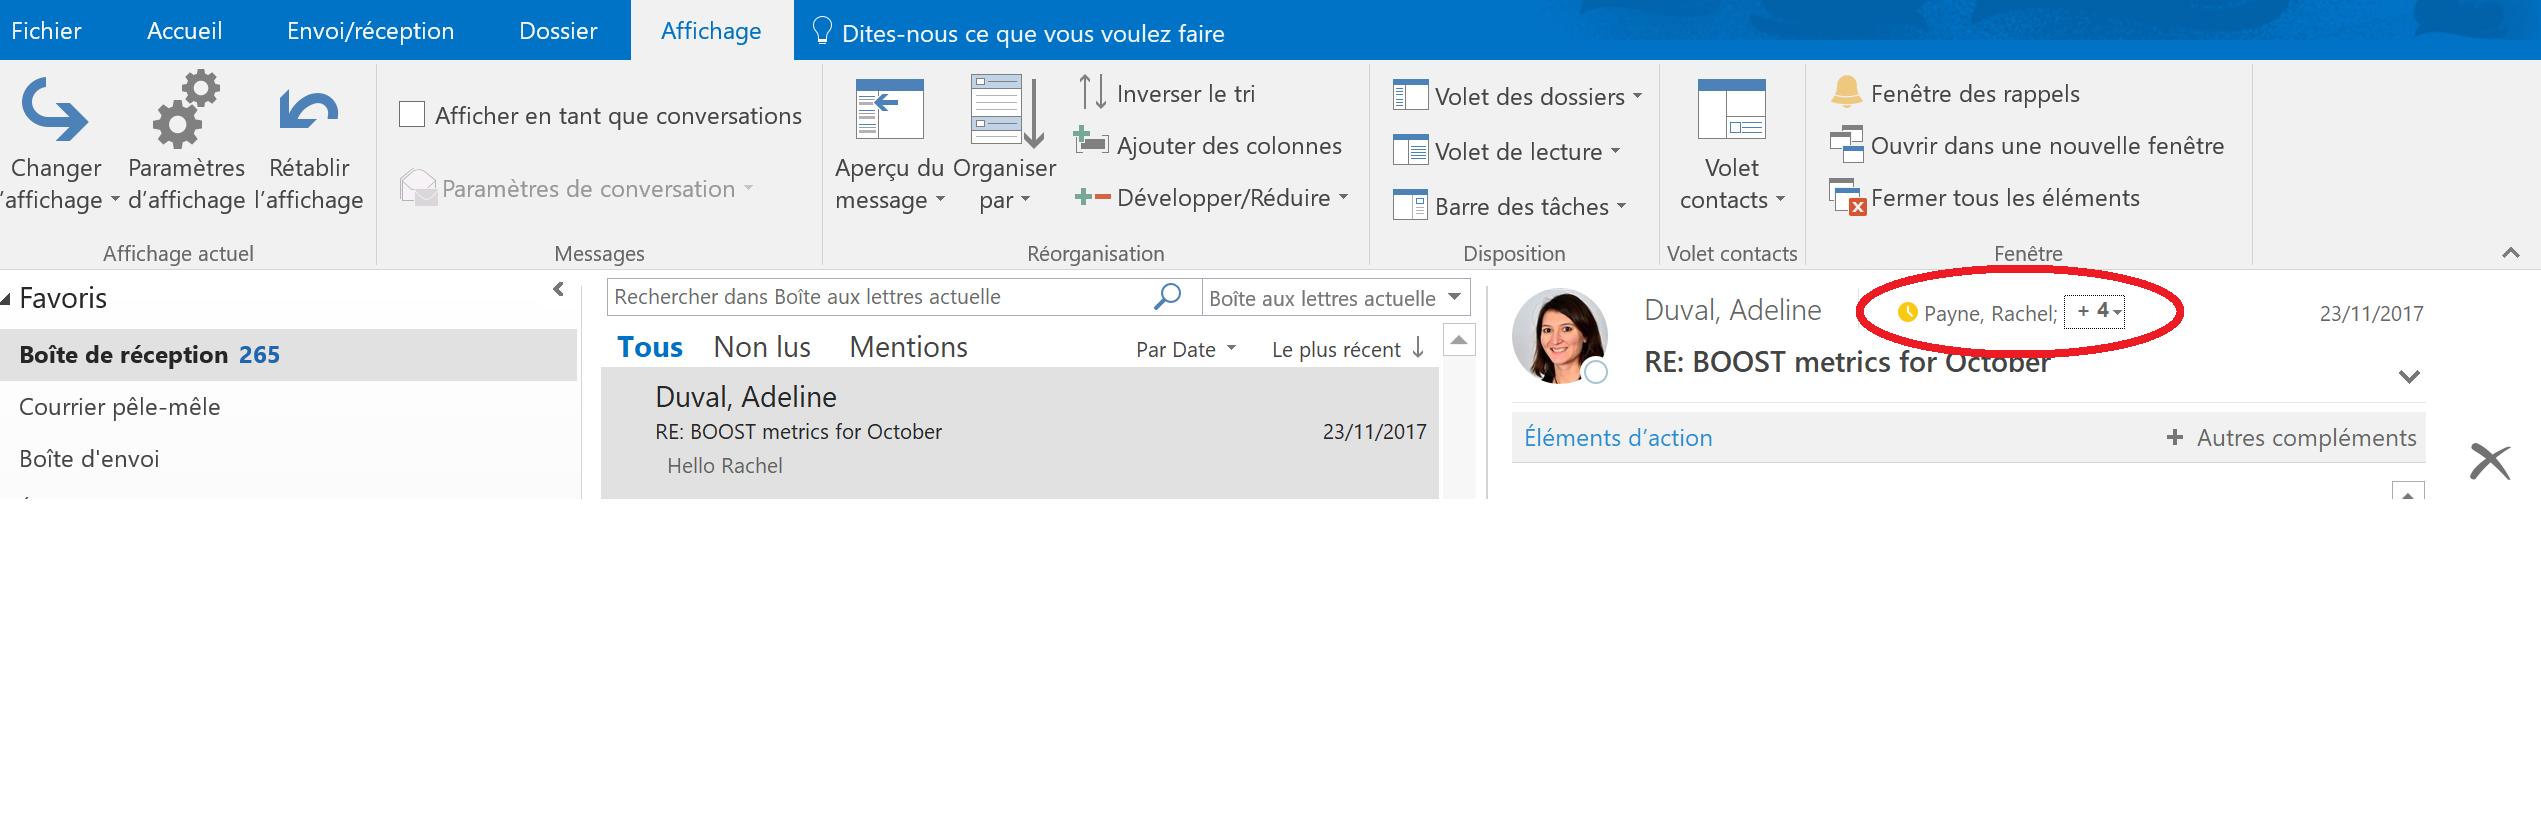 Nom : Outlook 1.png Affichages : 141 Taille : 145,4 Ko